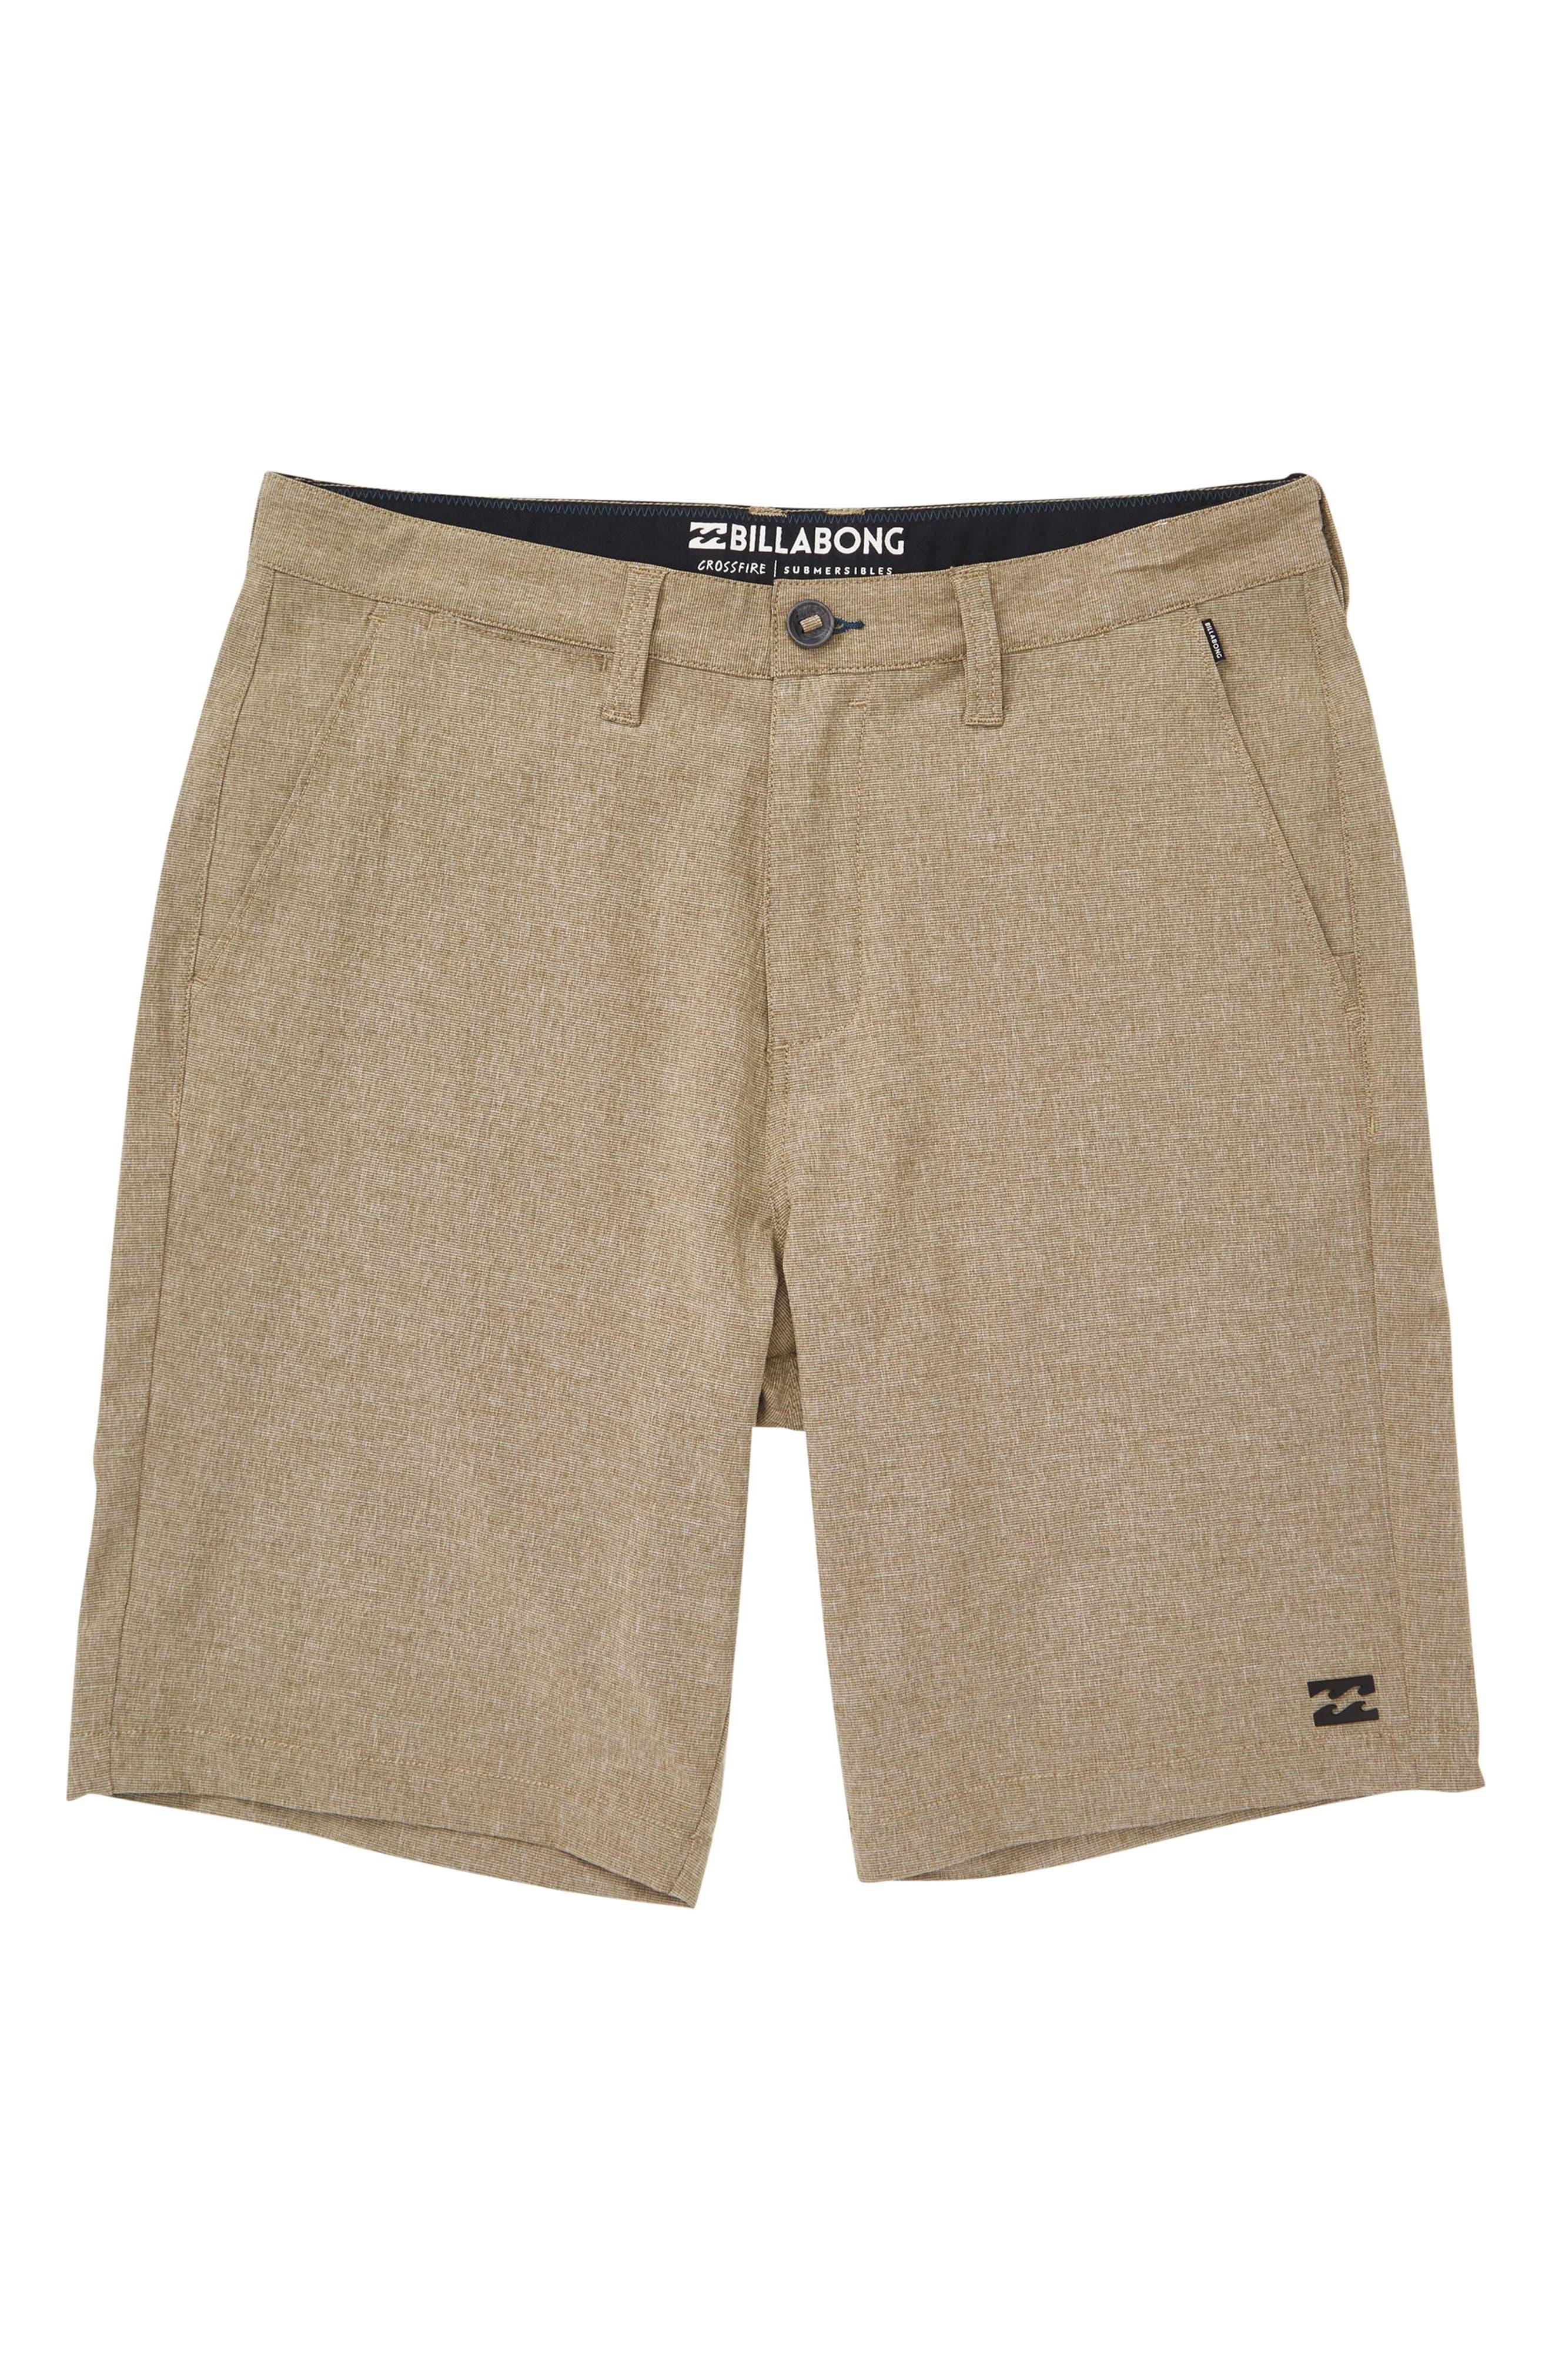 Boys Billabong Crossfire X Hybrid Shorts Size 26  Beige